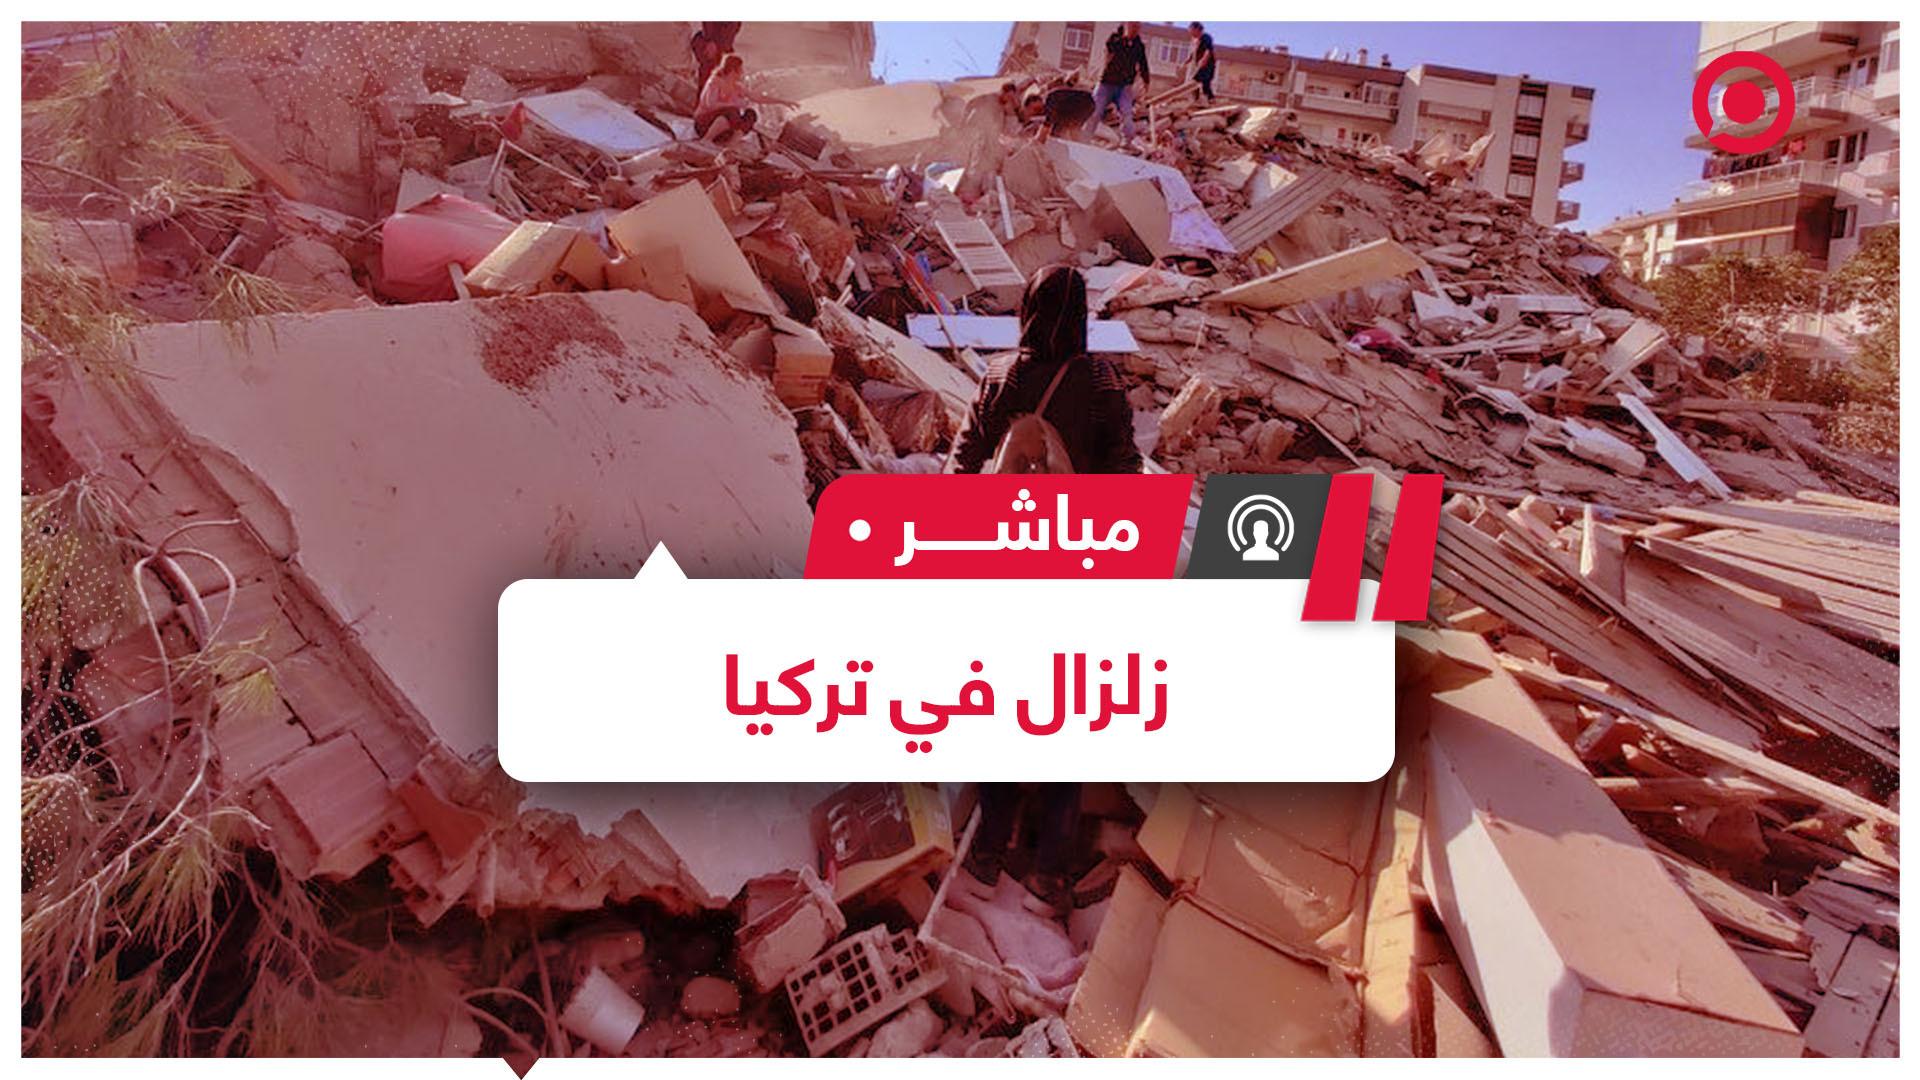 قتلى وجرحى في زلزال ضرب غرب تركيا وتسونامي جزئي يجتاح سواحلها